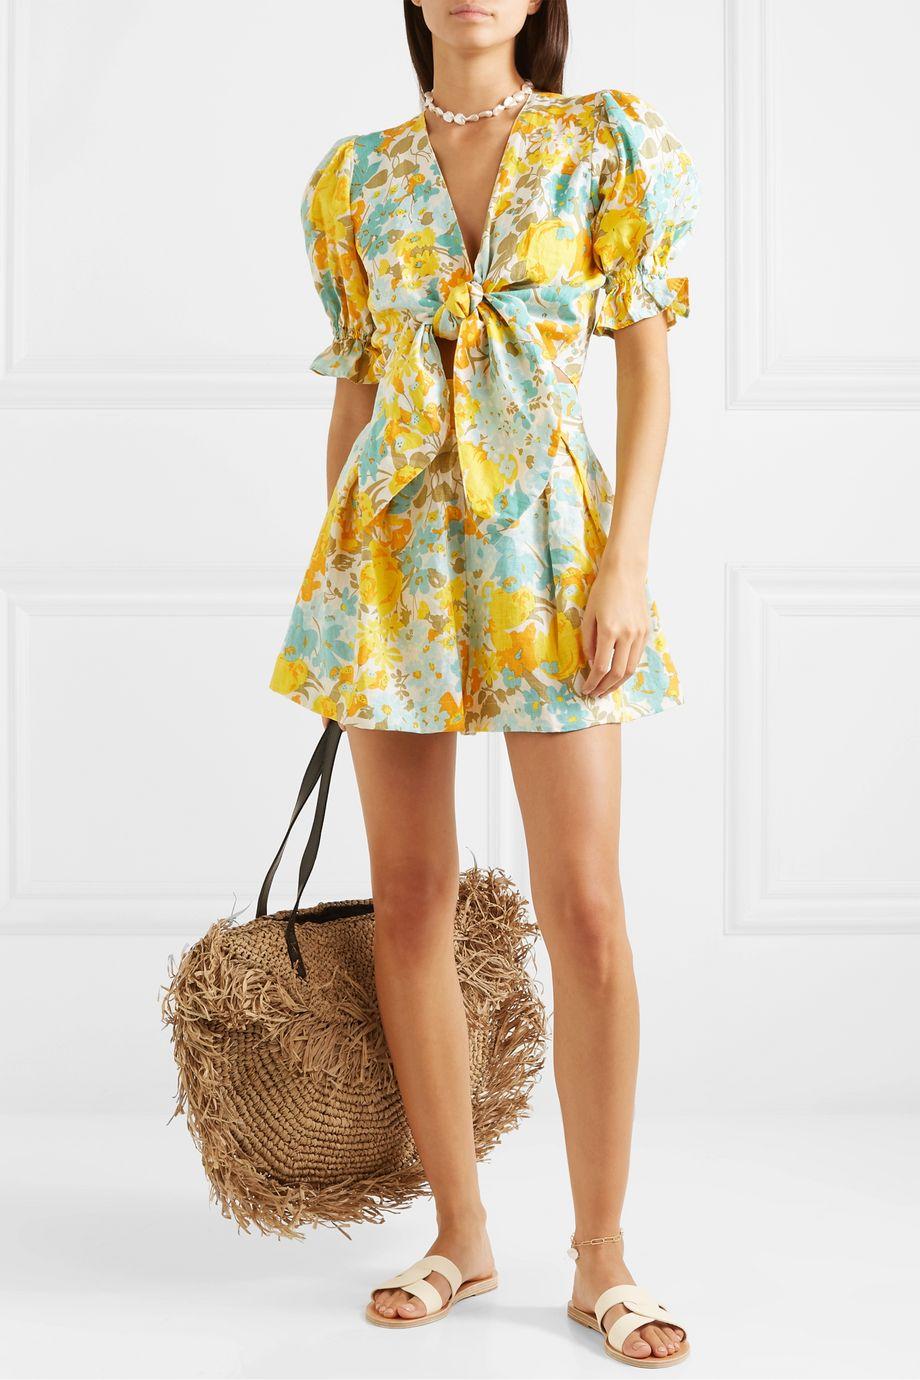 Faithfull The Brand Jamais cropped tie-front floral-print linen top